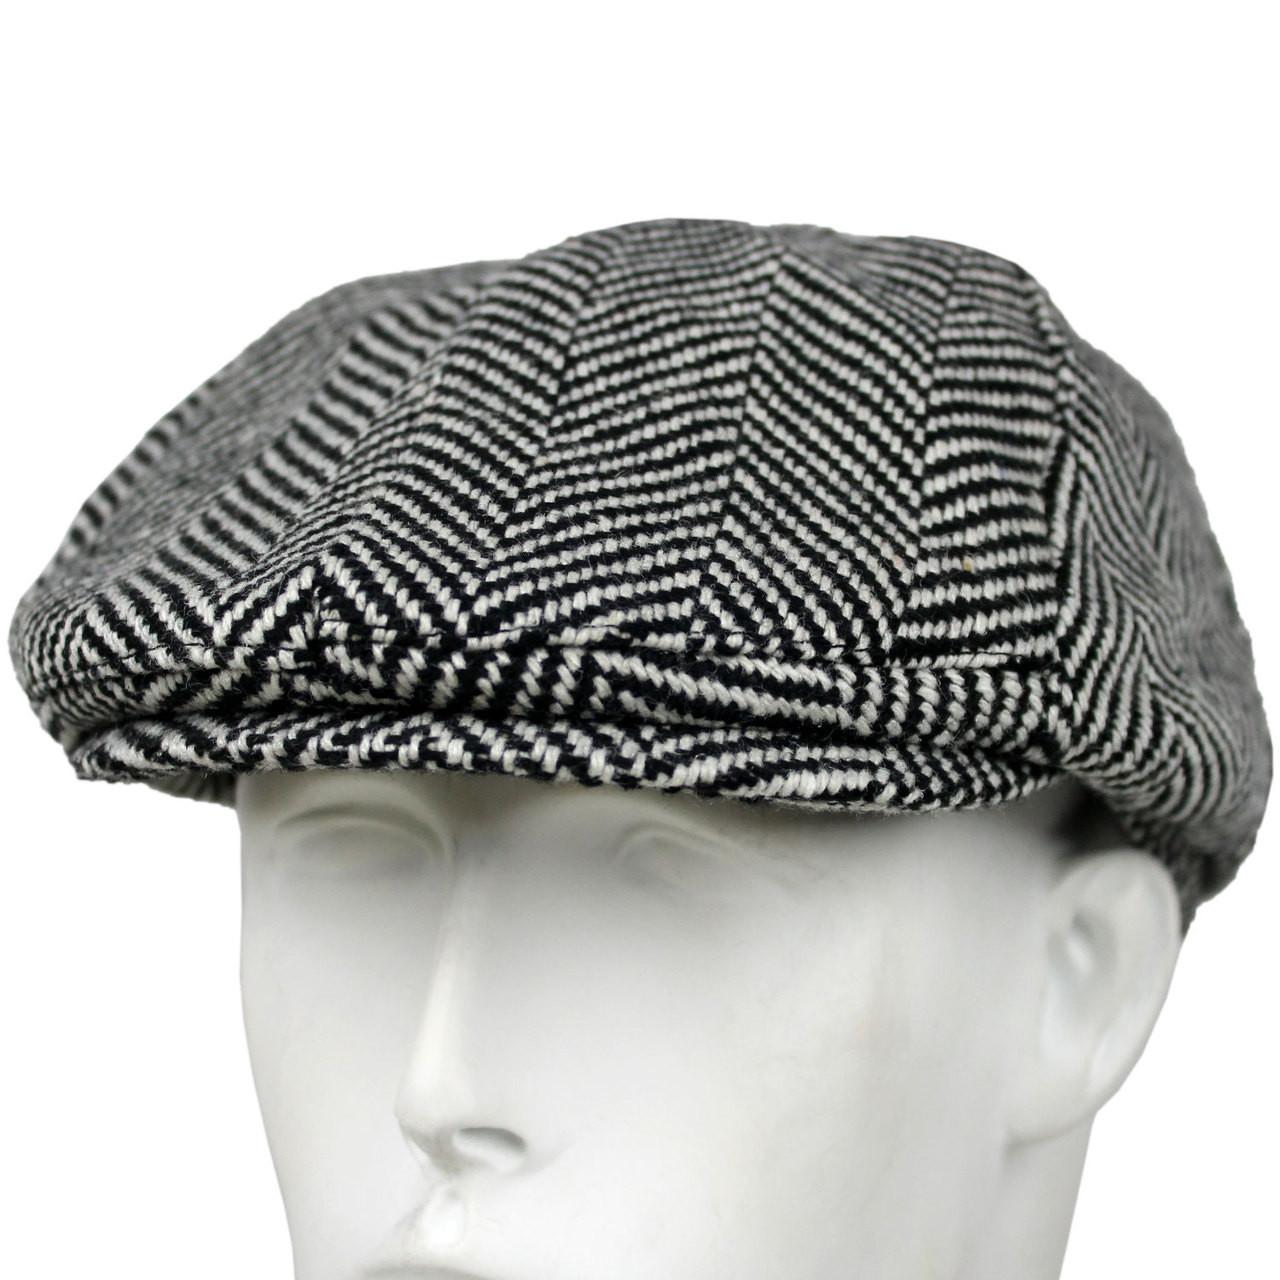 Fourstar Hat PAPERBOY BLACK WHITE FLAT CAP L XL 8d11cedc1e7